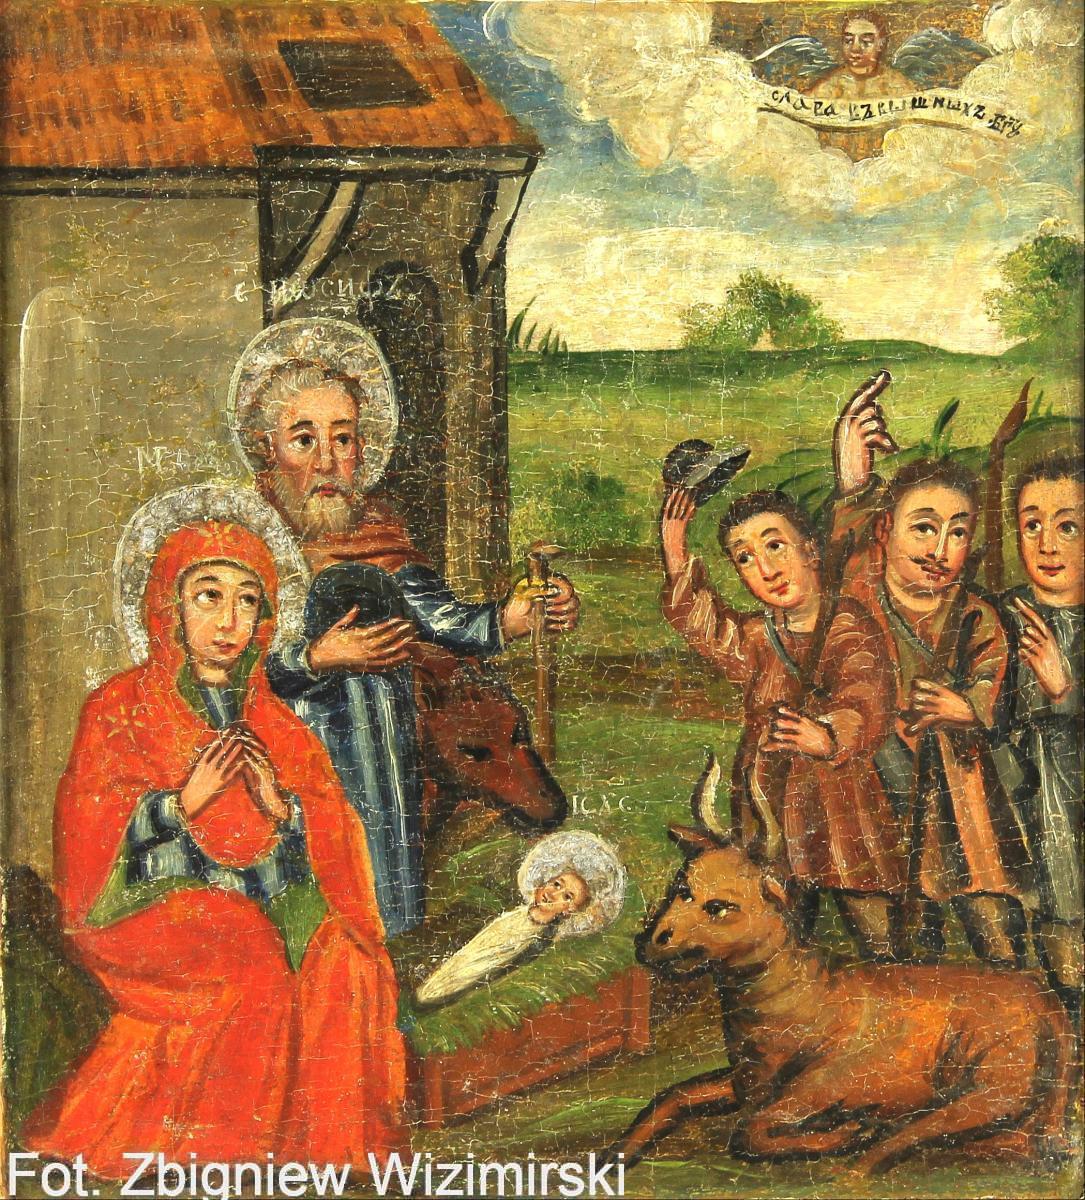 Ukłon pasterzy - Ukraina 17 wiek - Google Art Project